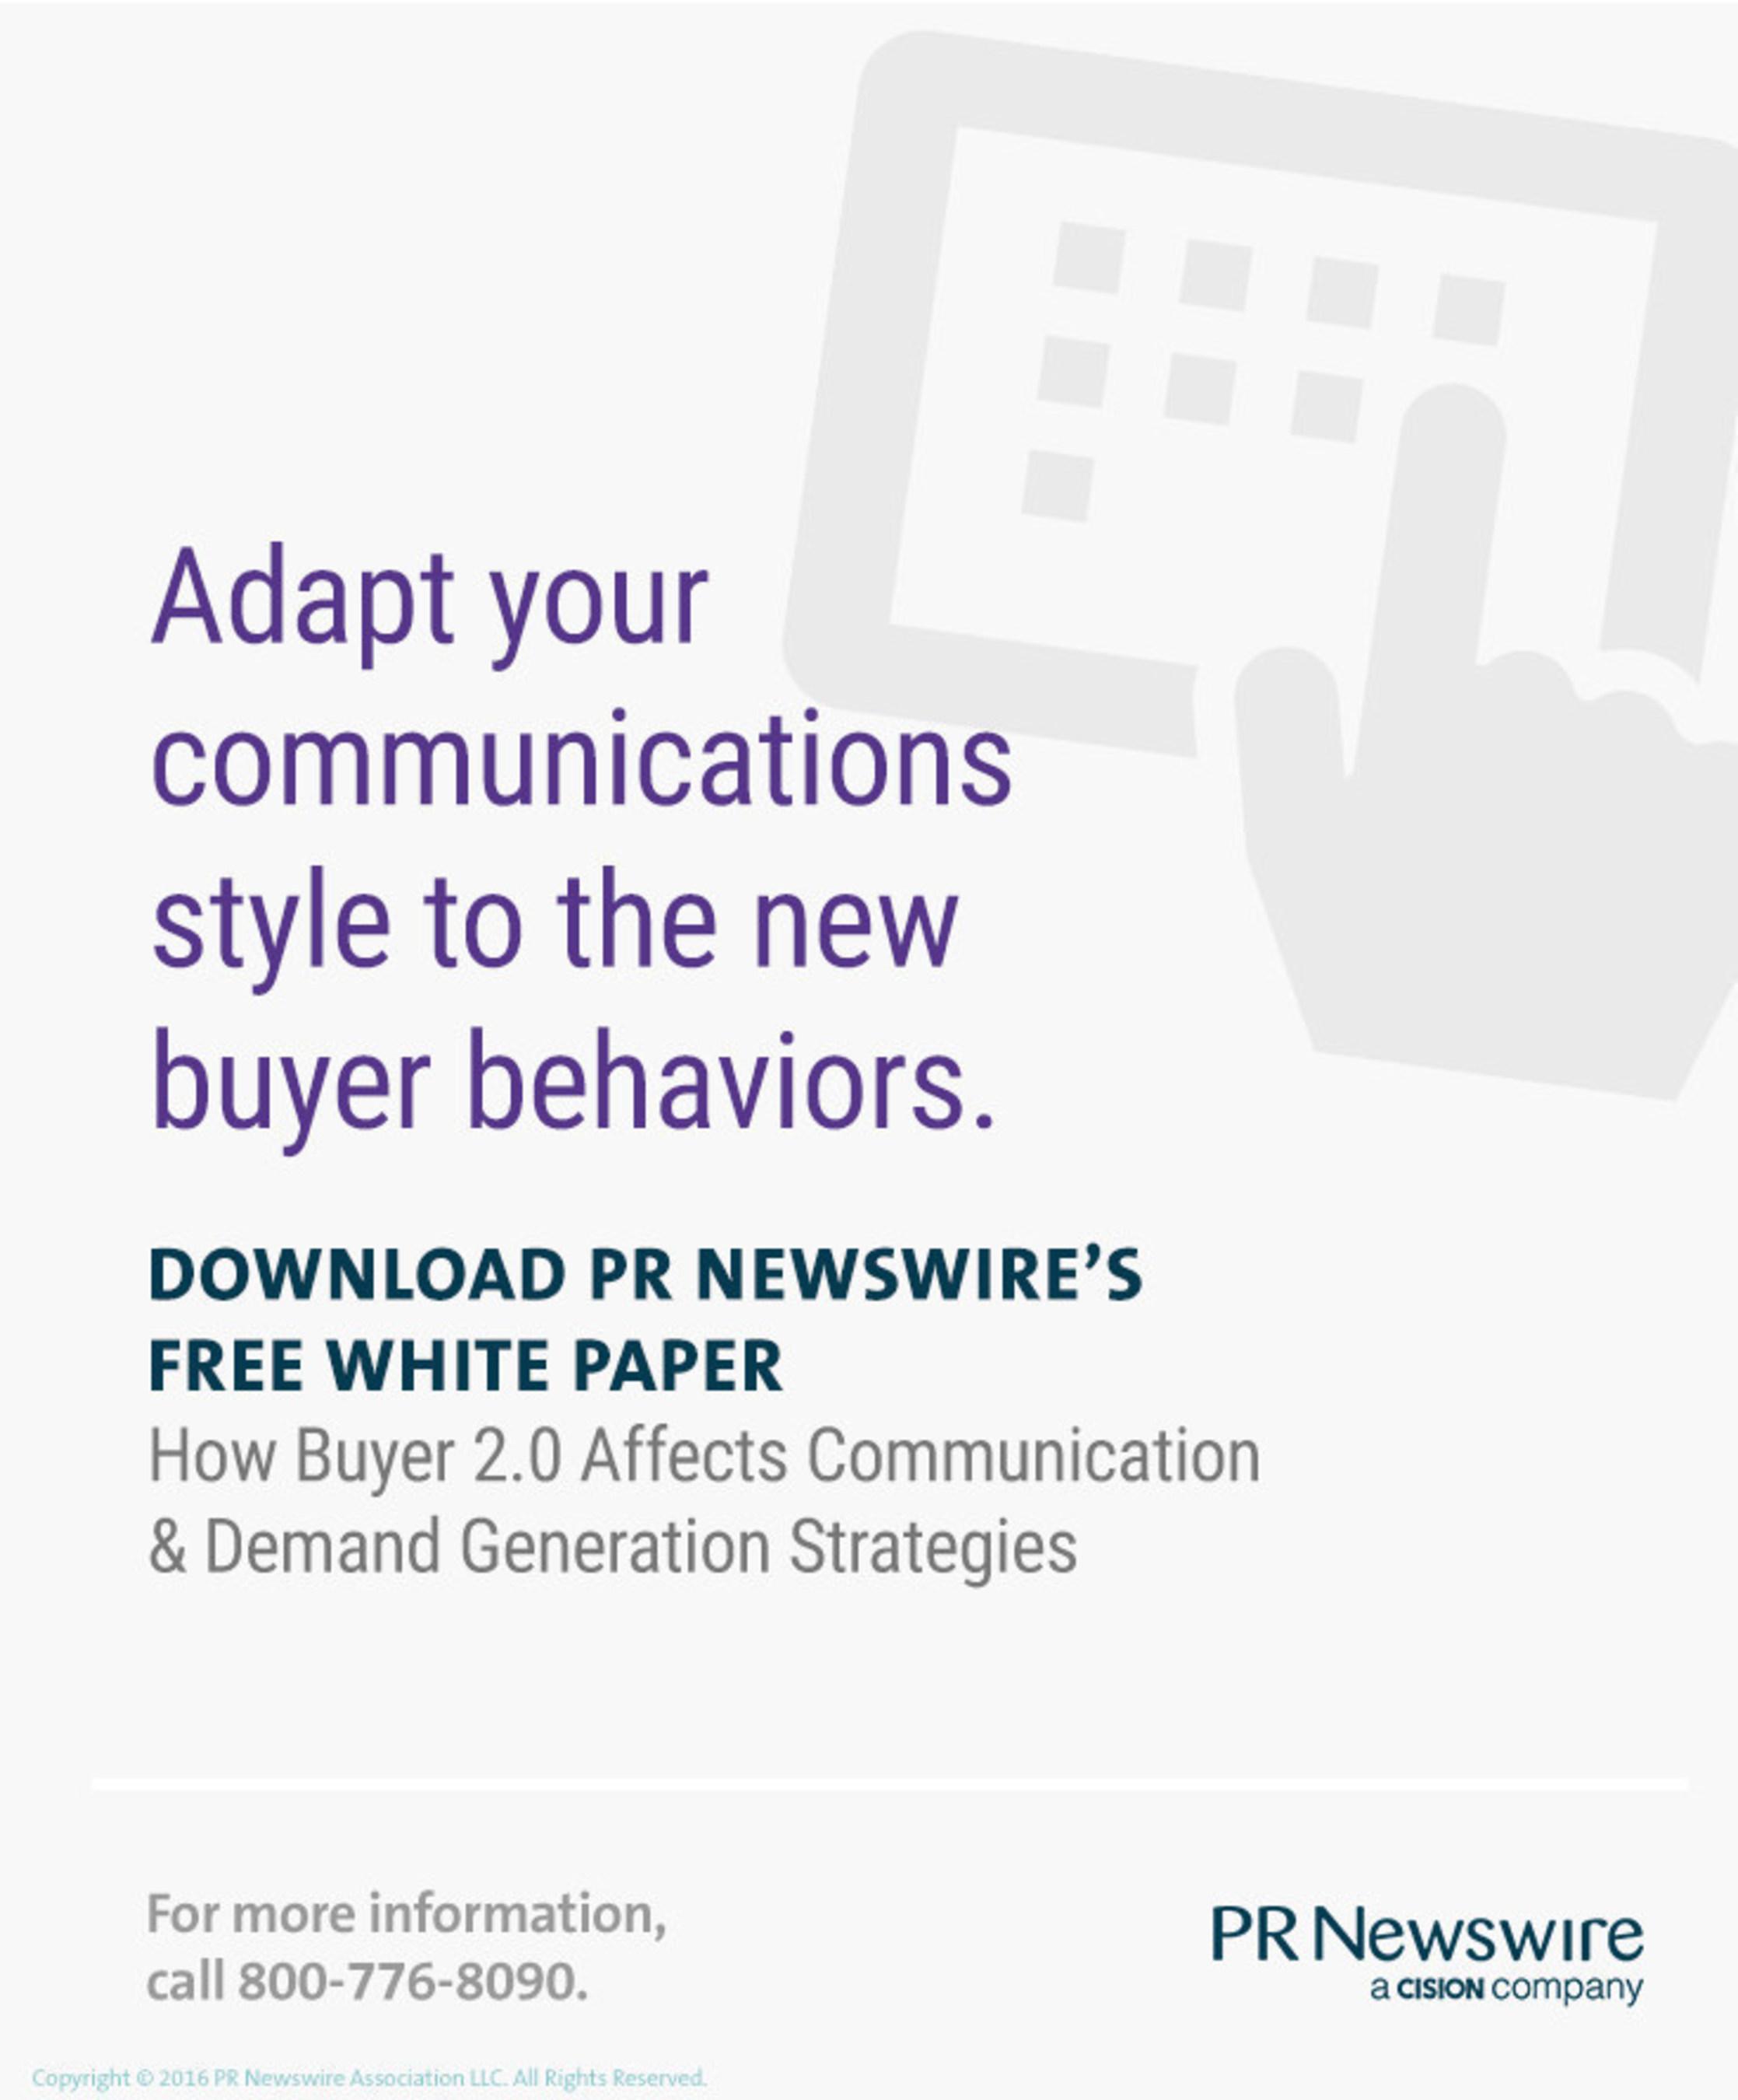 PR Newswire White Paper Explores Using Buyer 2.0 to Shape Communication & Demand Generation Strategies